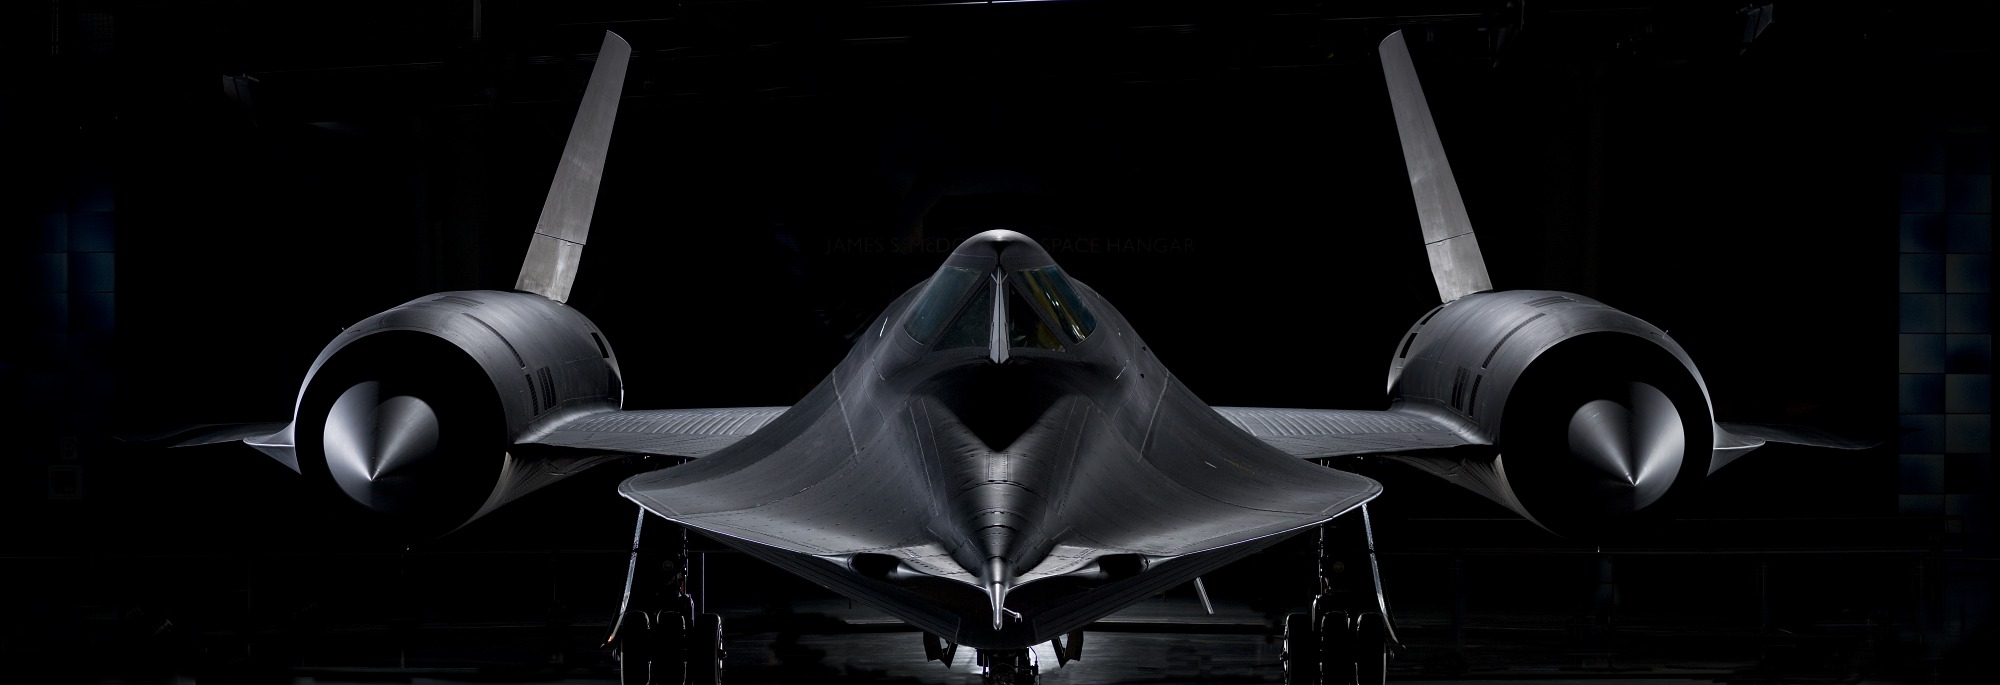 Lockheed SR-71 Blackbird | National Air and Space Museum